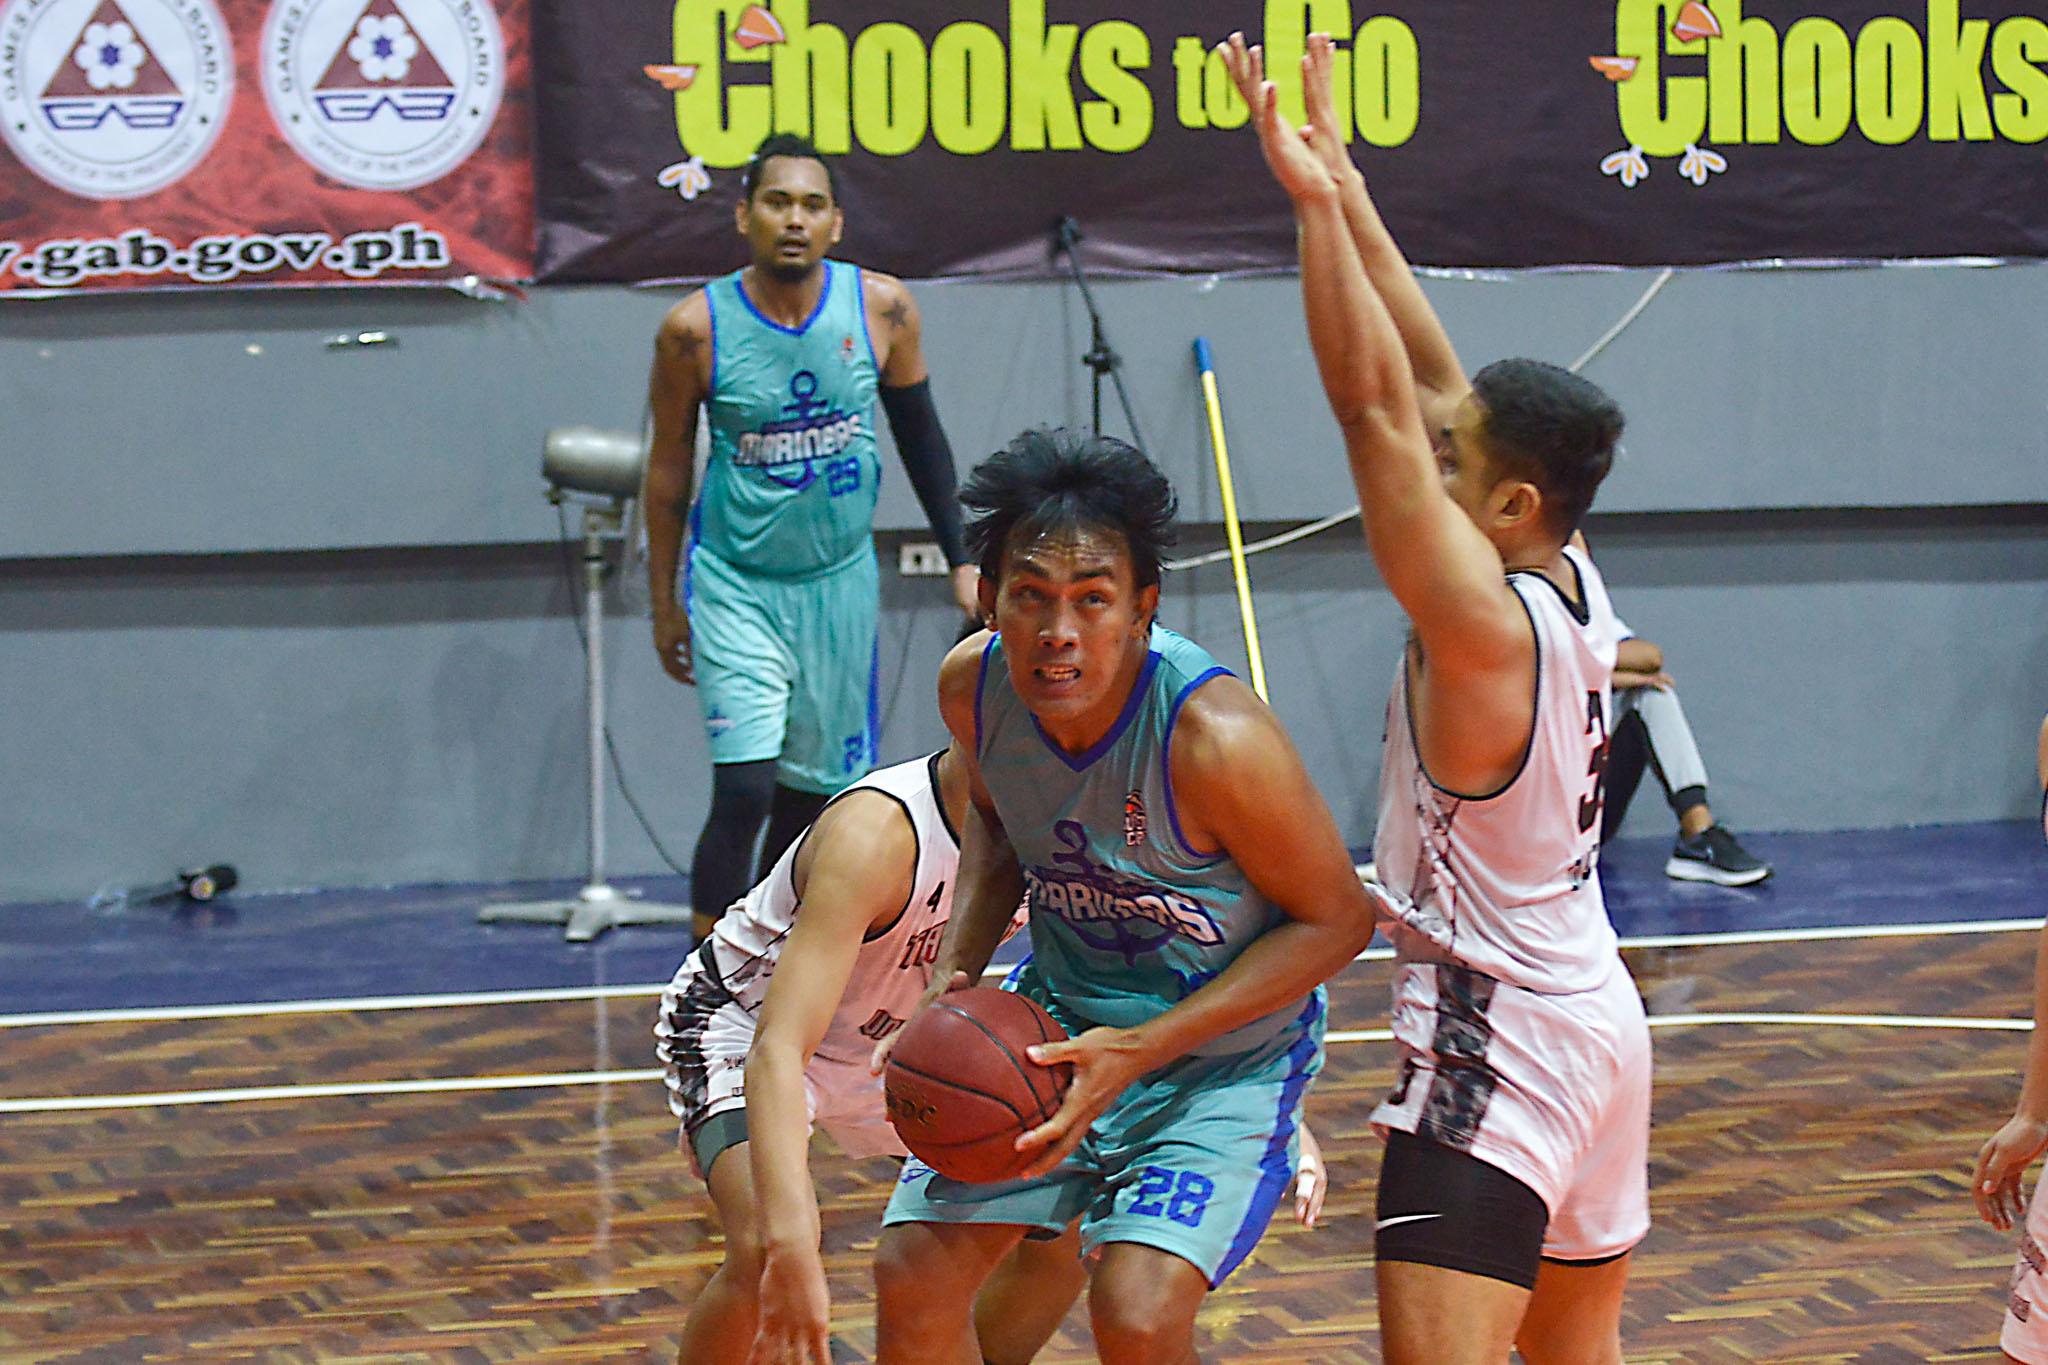 2021-Chooks-to-Go-VisMin-Cup-Visayas-Tabogon-vs-Tubigon-Pari-Llagas Tubigon Bohol's lady boss proves to be lucky charm for Mariners Basketball News VisMin Super Cup  - philippine sports news